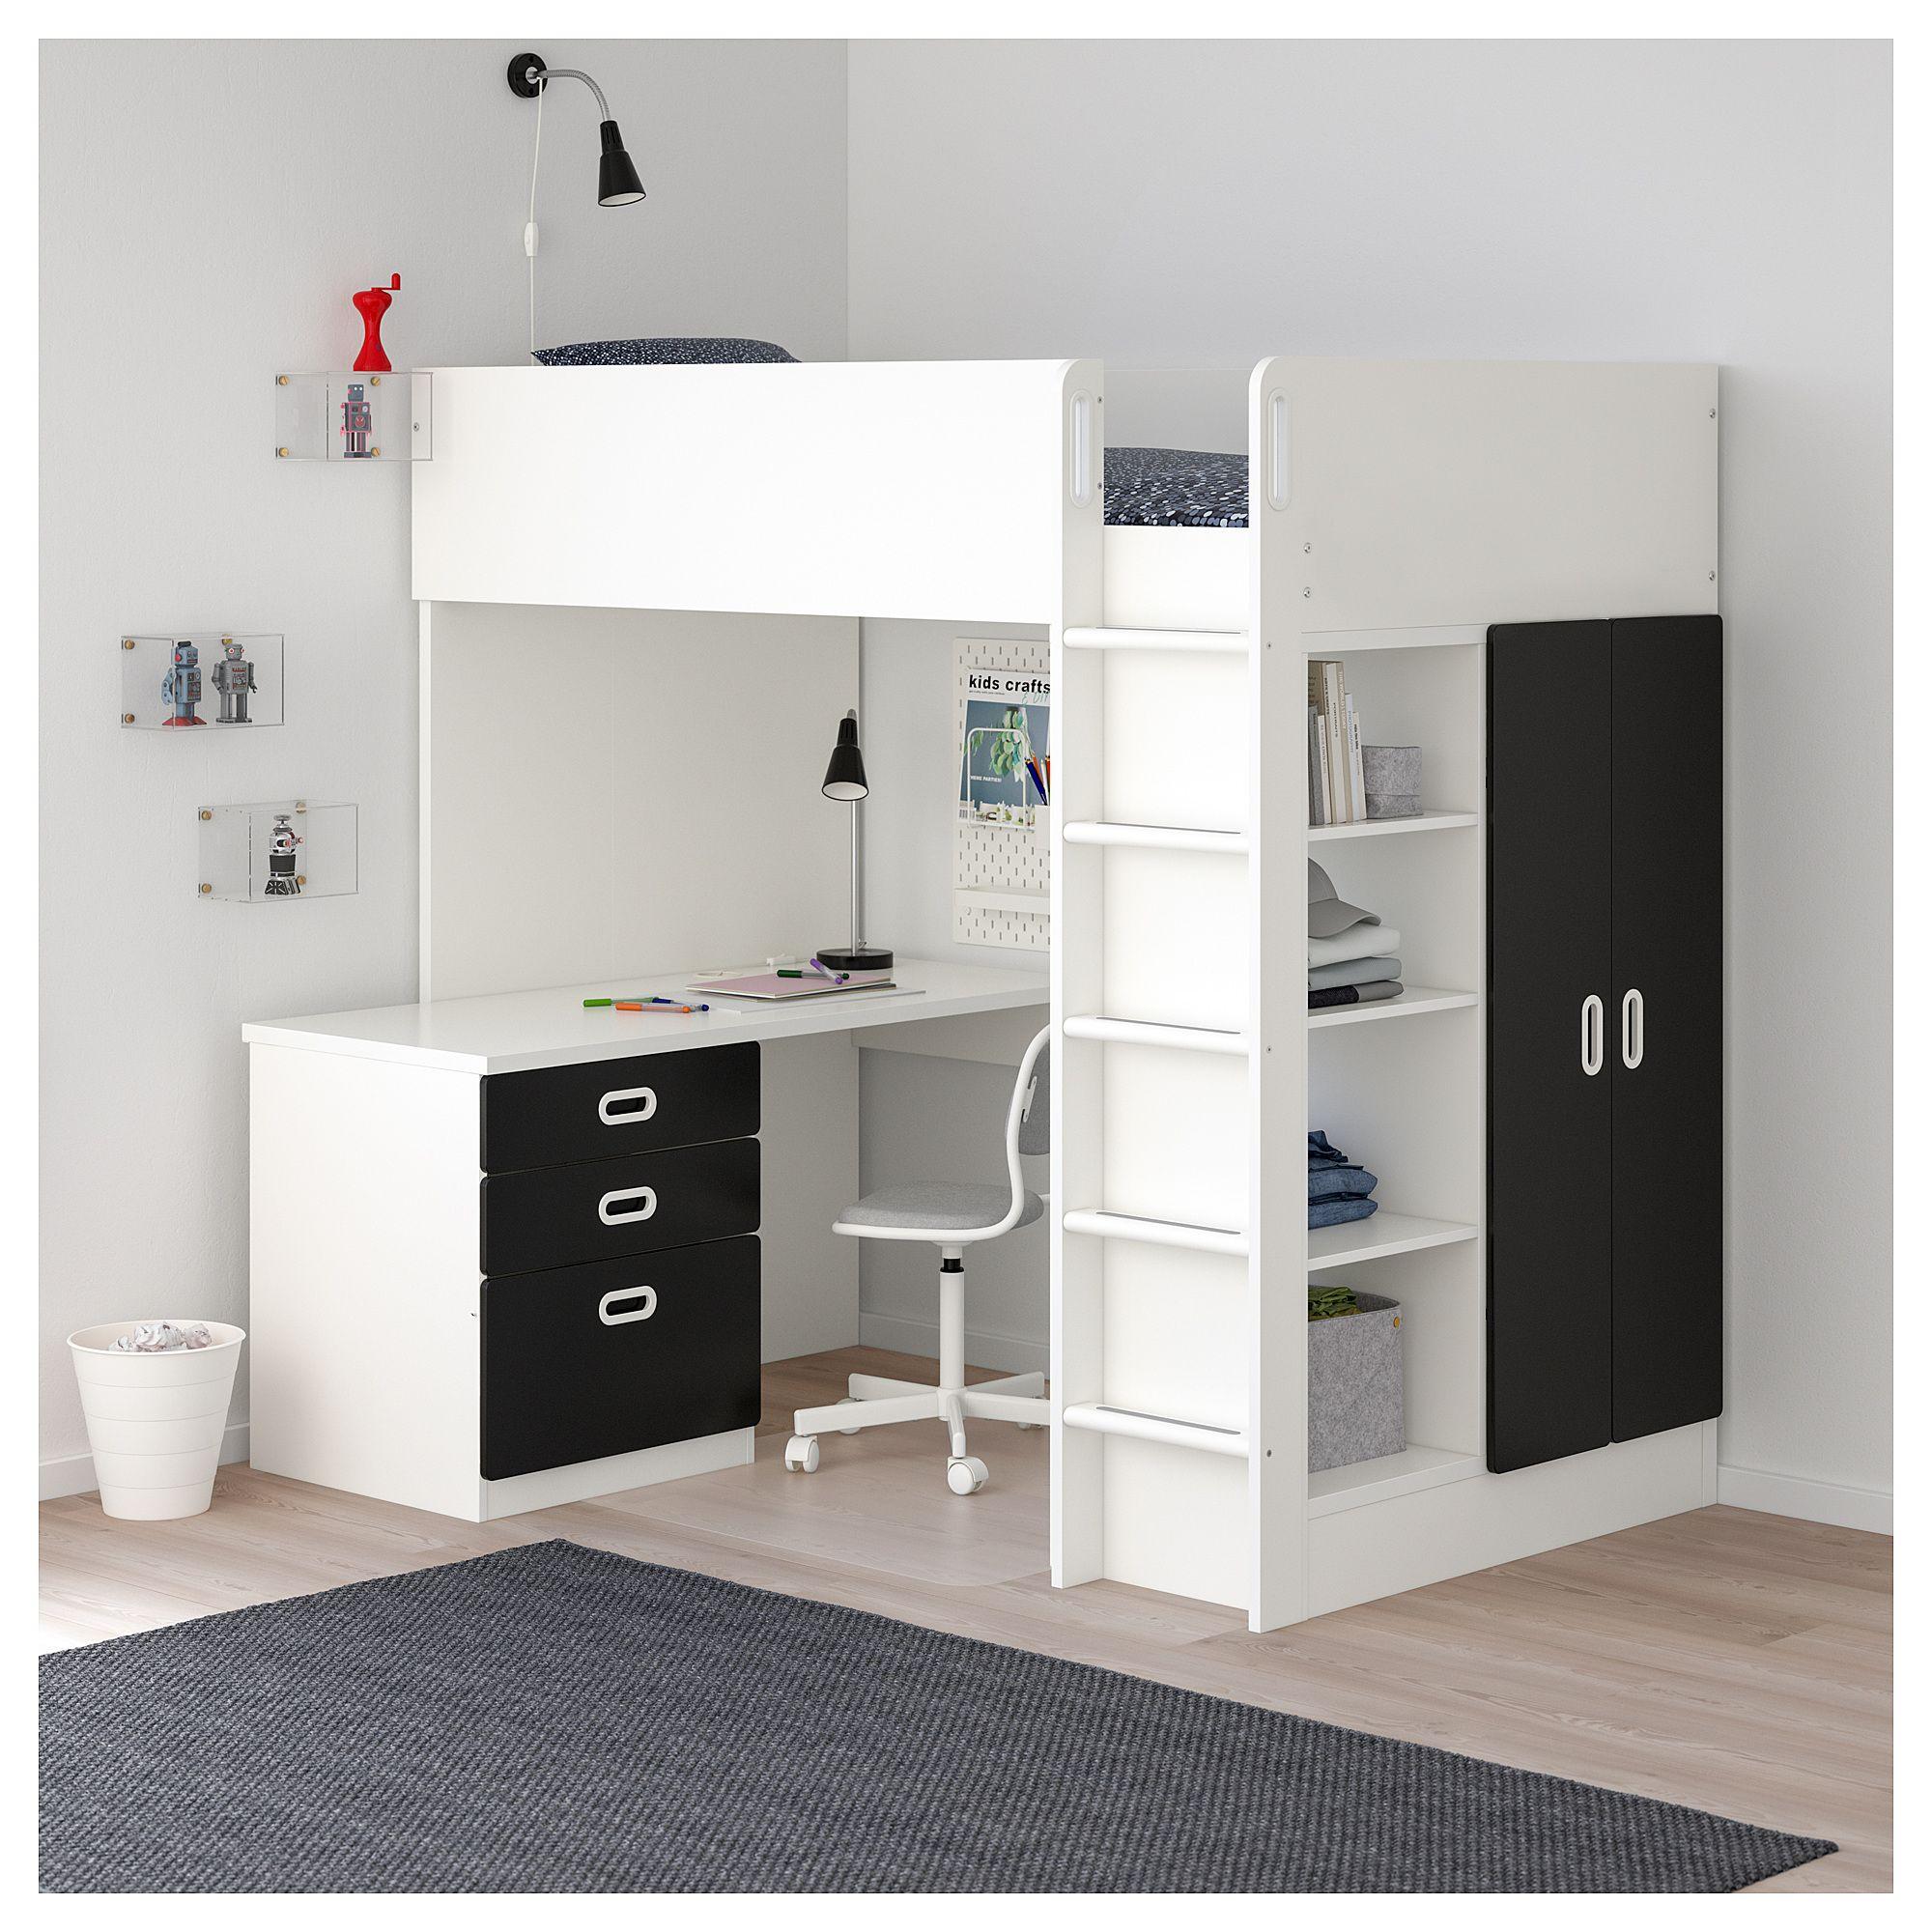 With 3 Loft Bed Ikea Fritids Drawers2 Doors WhiteEn Stuva qMLSzVpGU